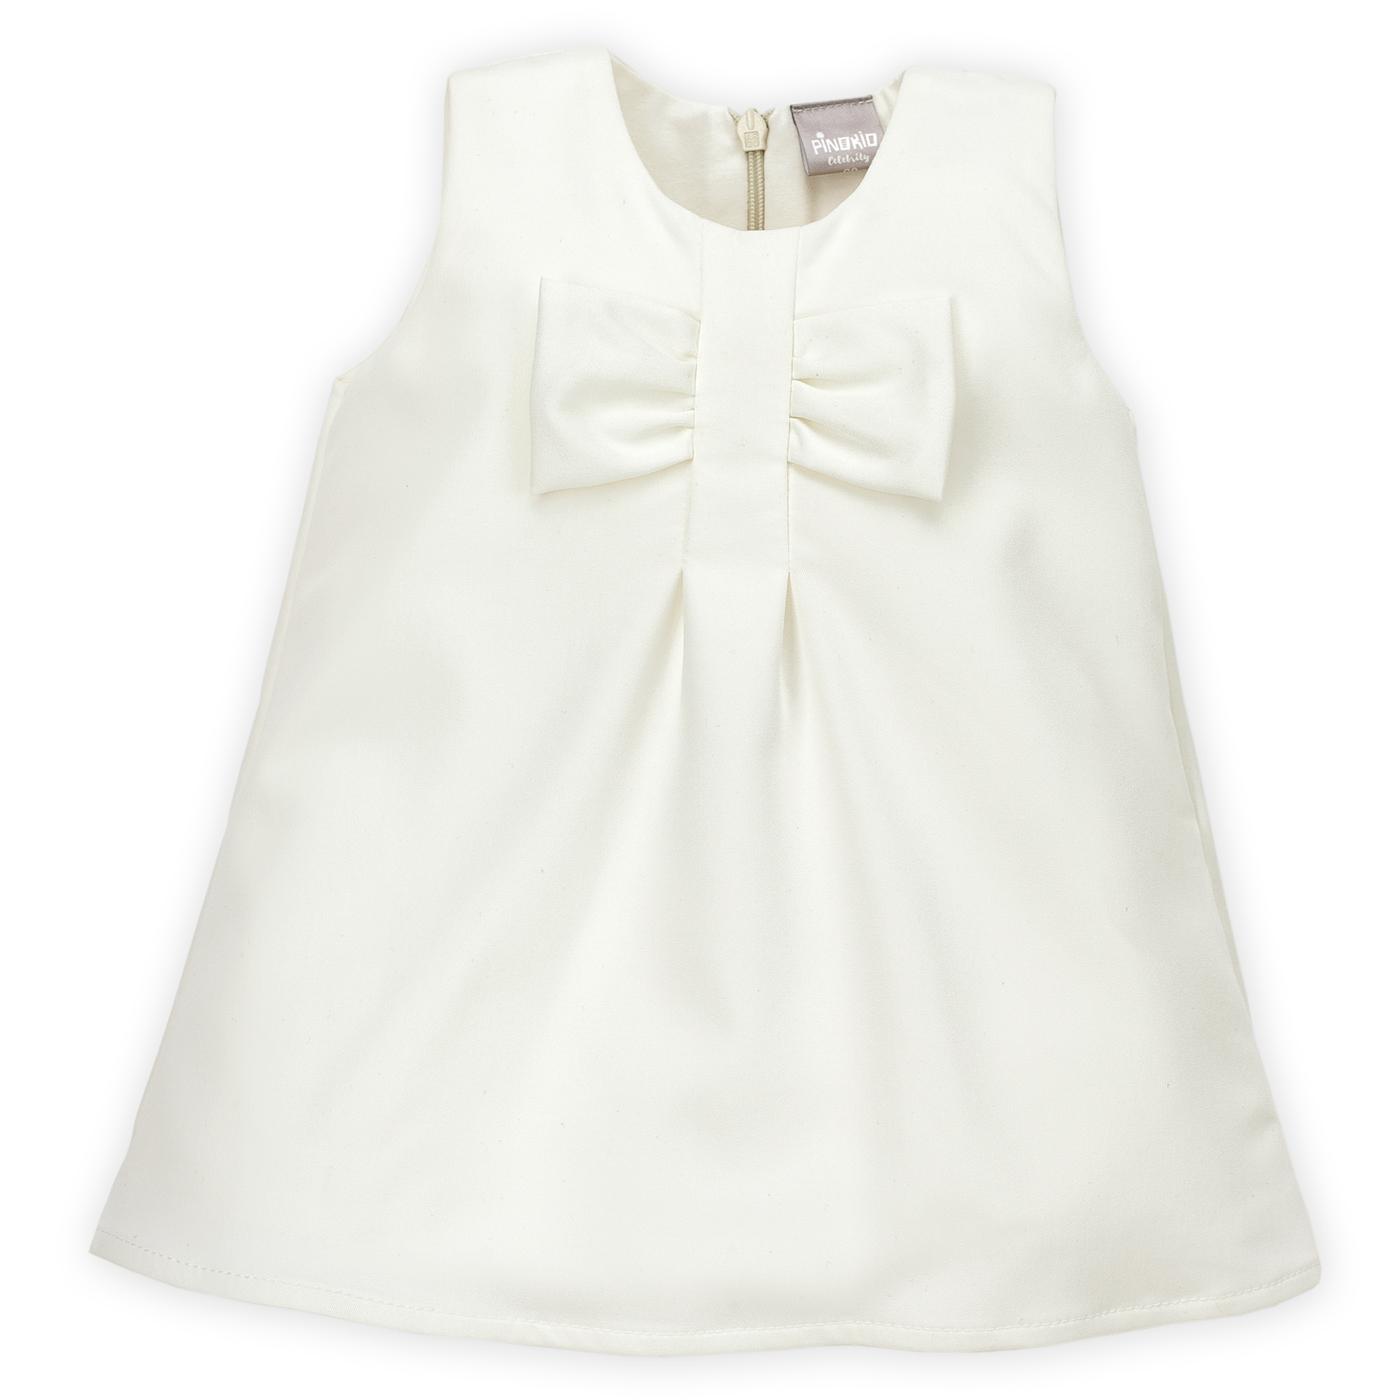 1ce176ecf Pinokio Dievčenské šaty s mašľou - biele, 74 cm | BabyRecenzie.sk